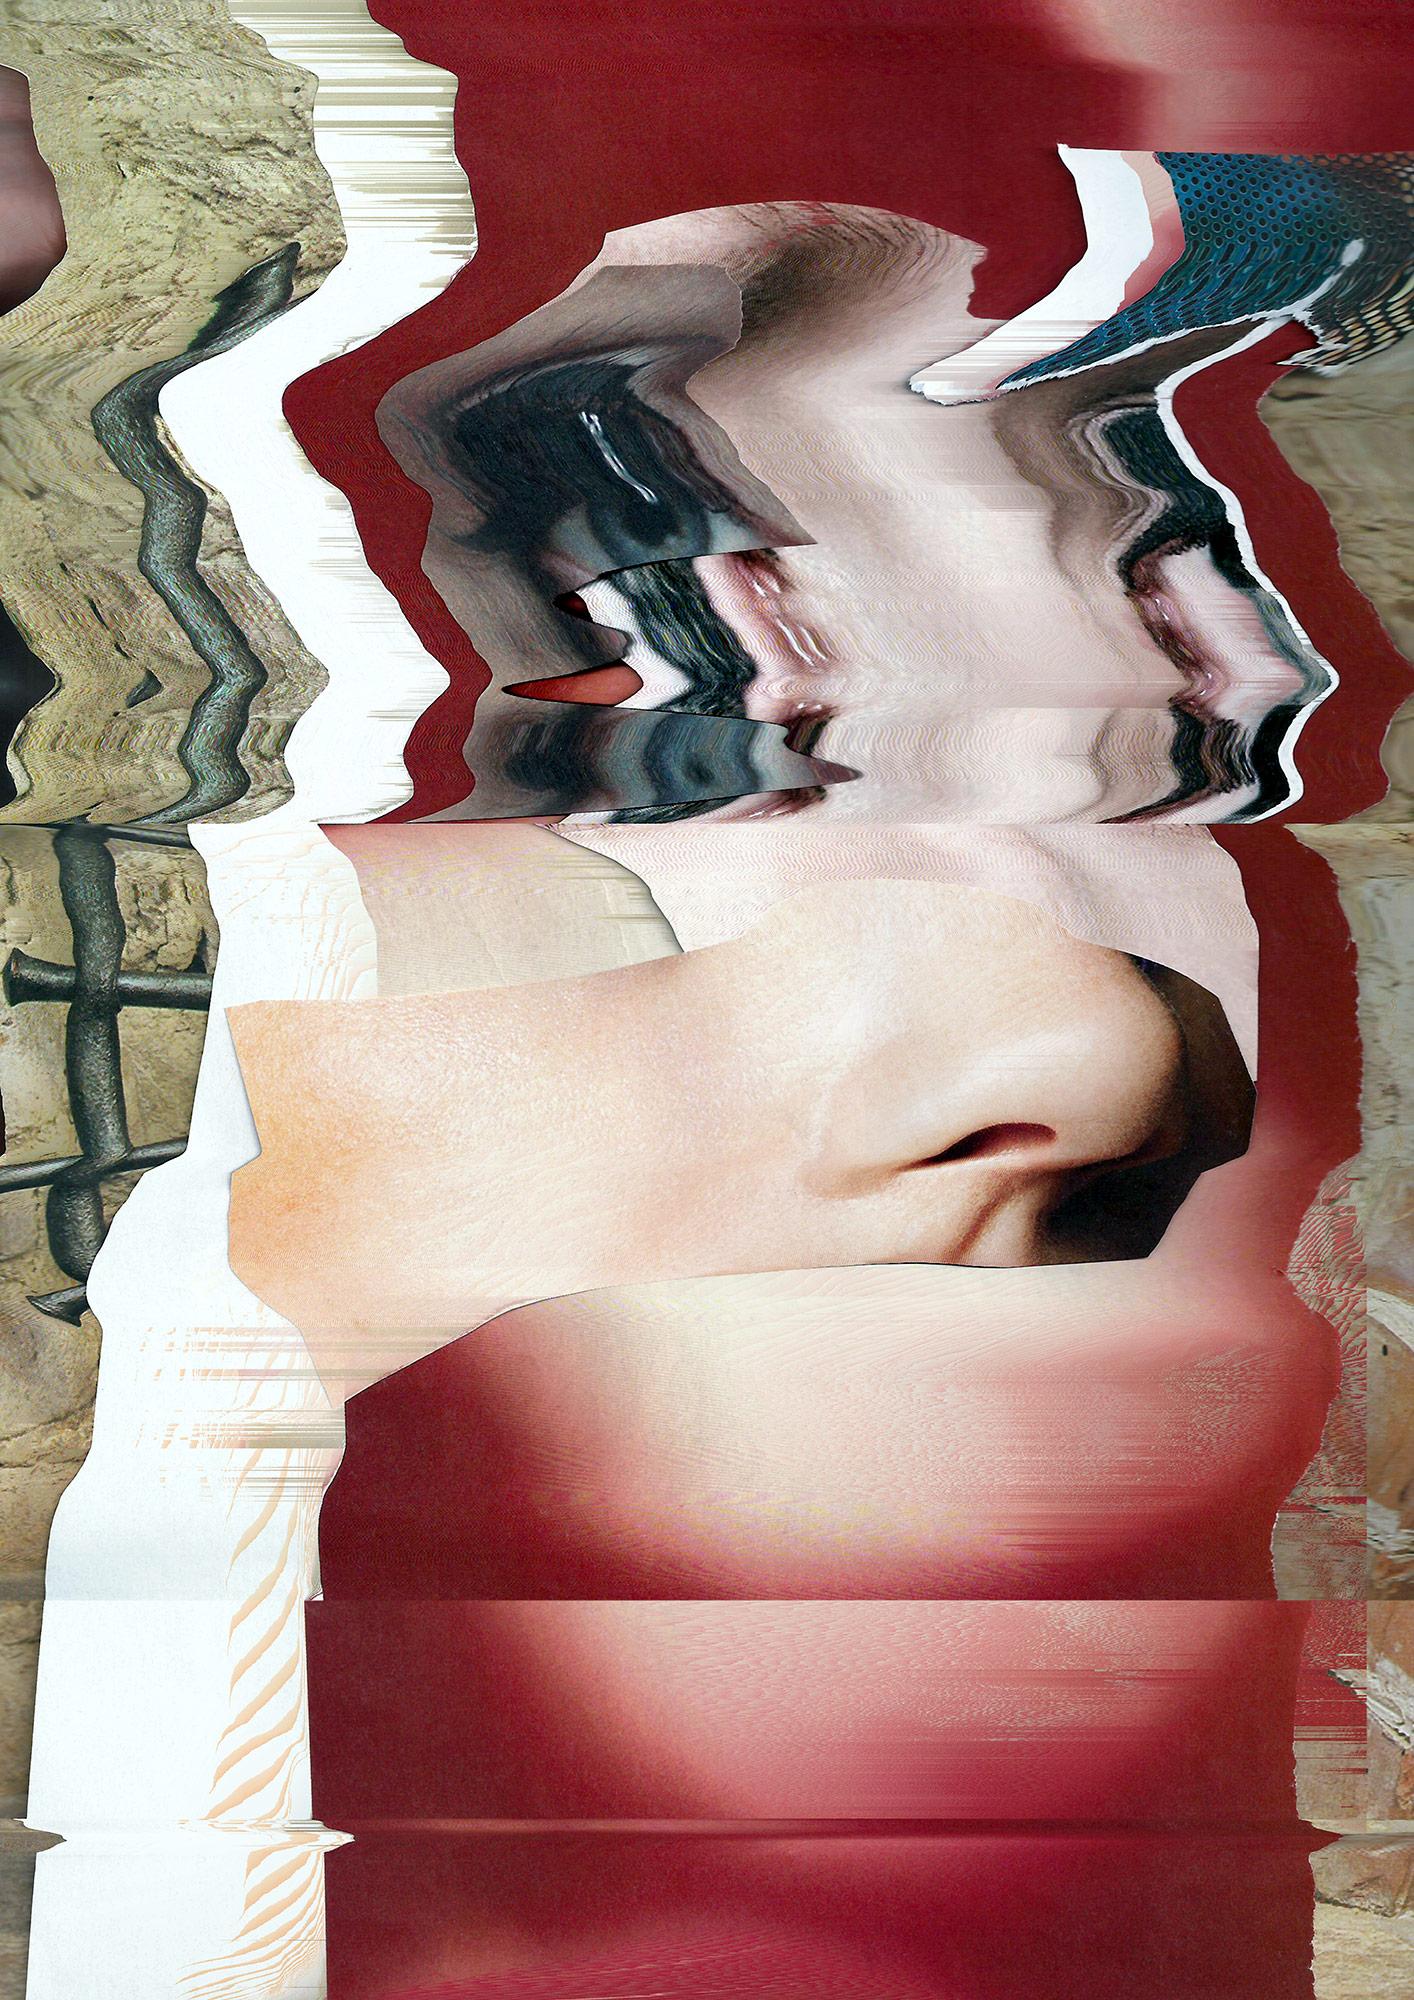 Ewa Doroszenko - Radical Beauty 05, photography